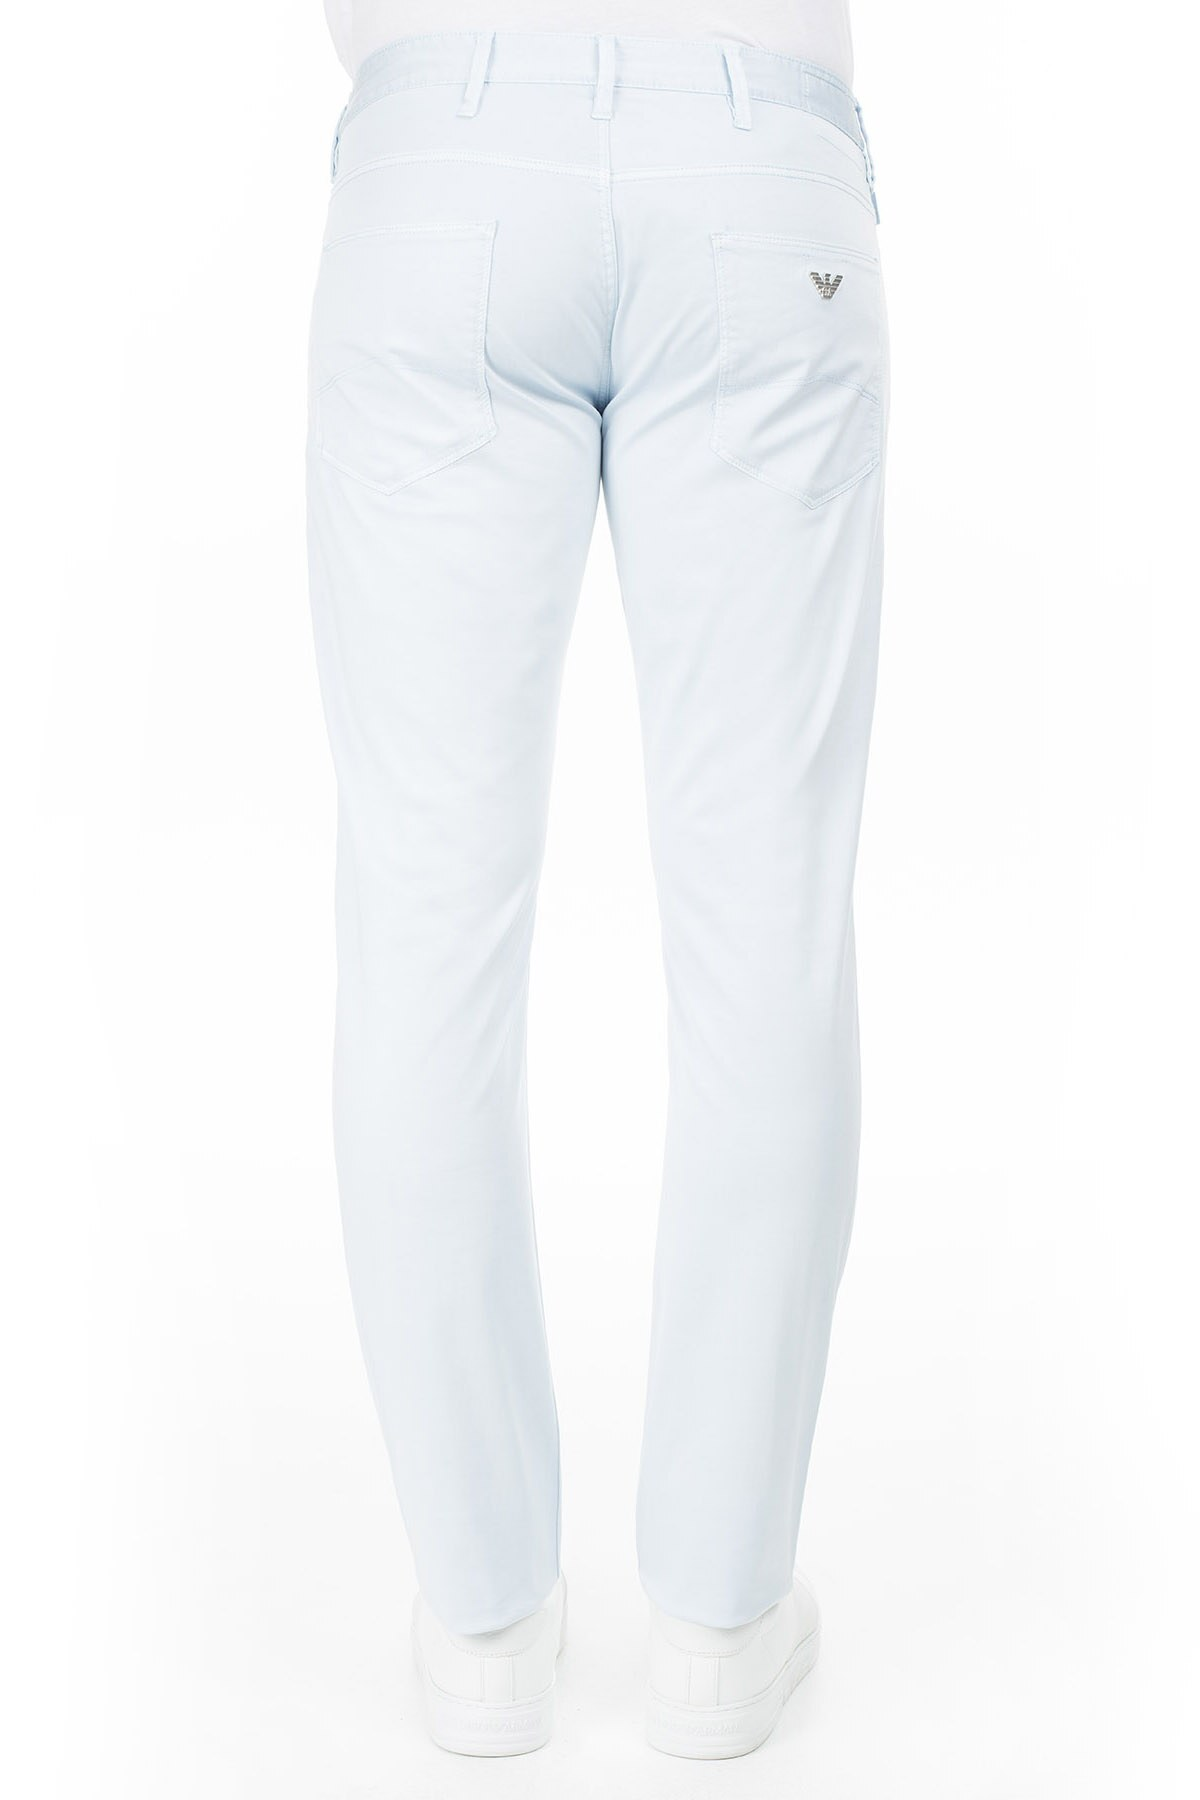 Armani J06 Jeans Erkek Pamuklu Pantolon 3Y6J06 6NEDZ 0504 AÇIK MAVİ